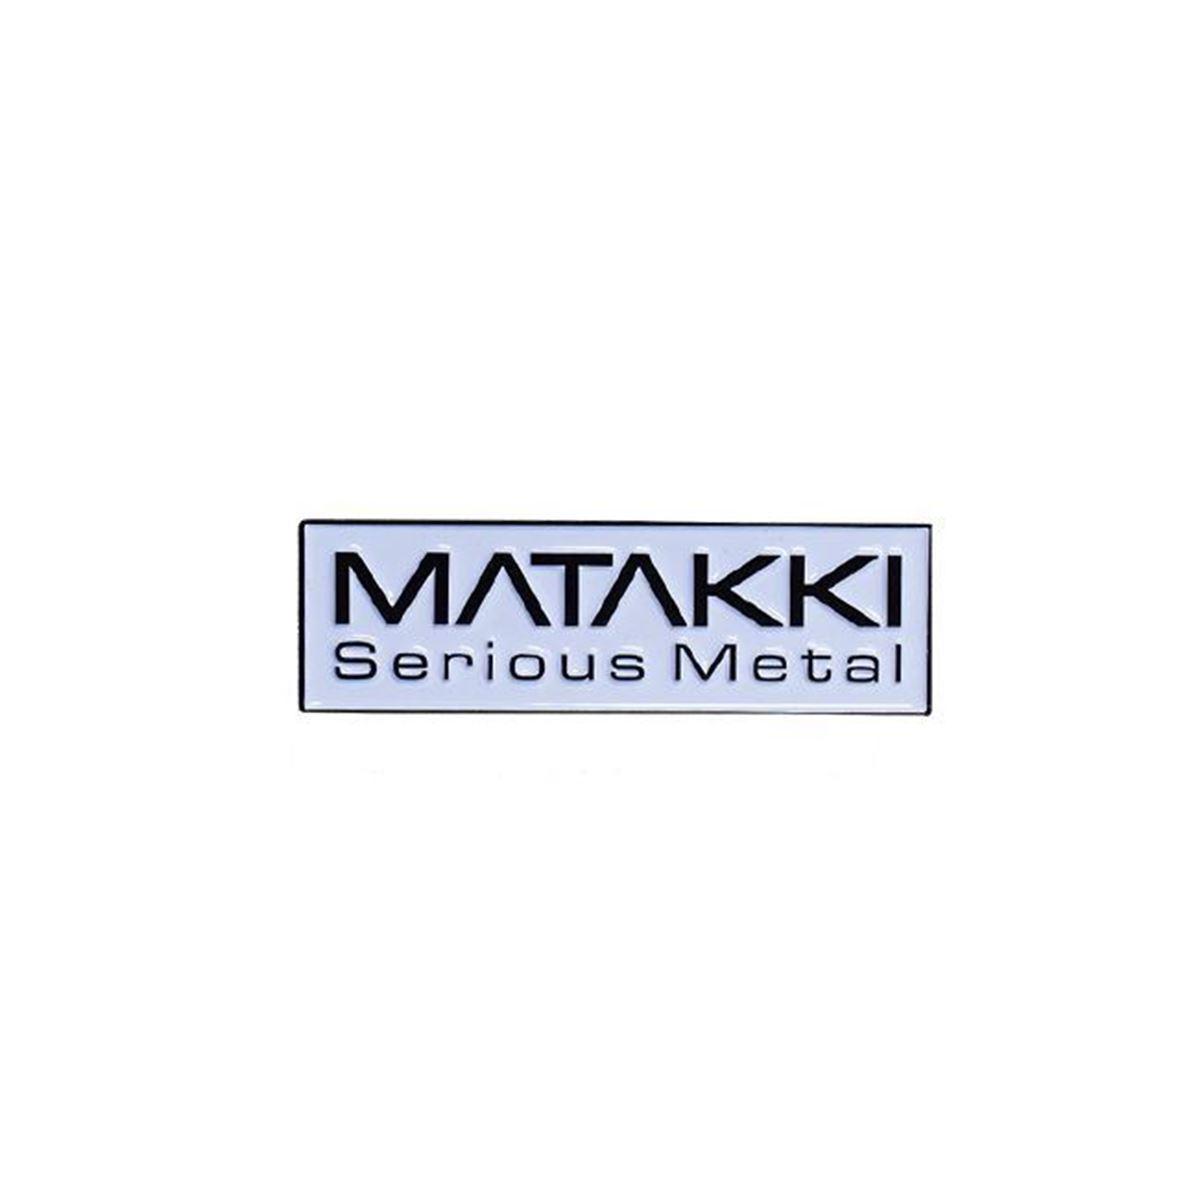 Picture of Matakki Serious Metal Pin Badge